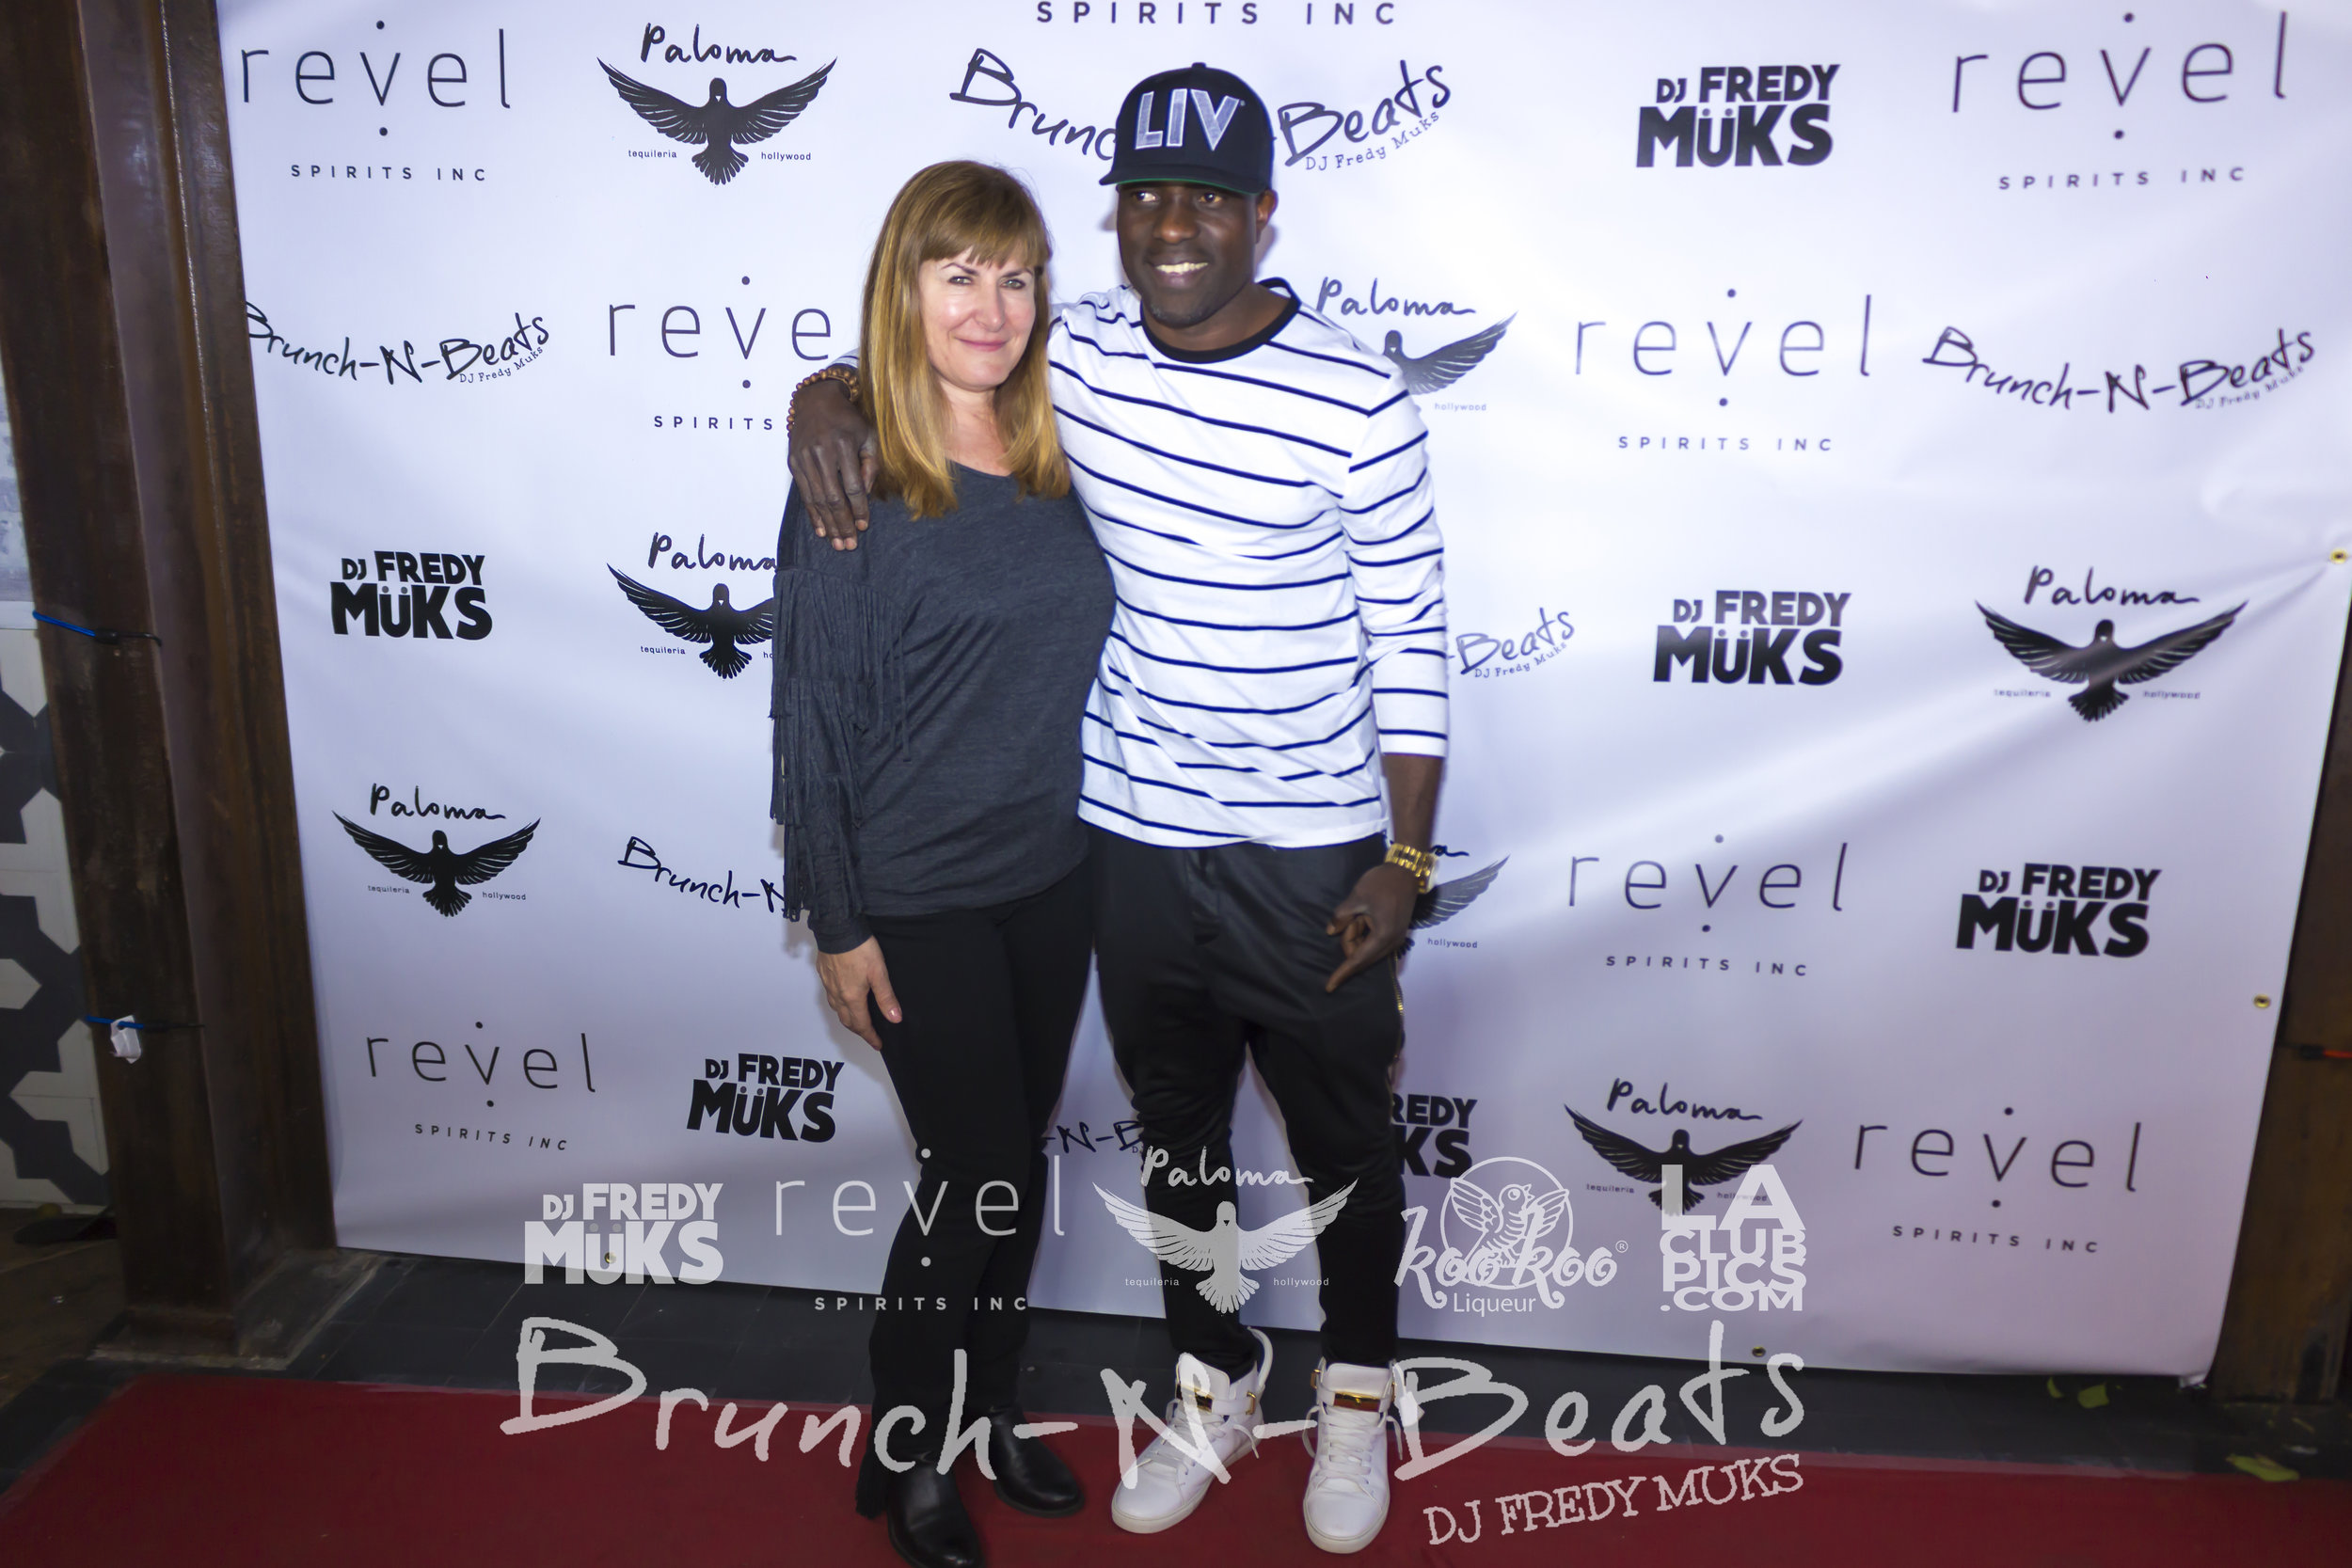 Brunch-N-Beats - Paloma Hollywood - 02-25-18_174.jpg